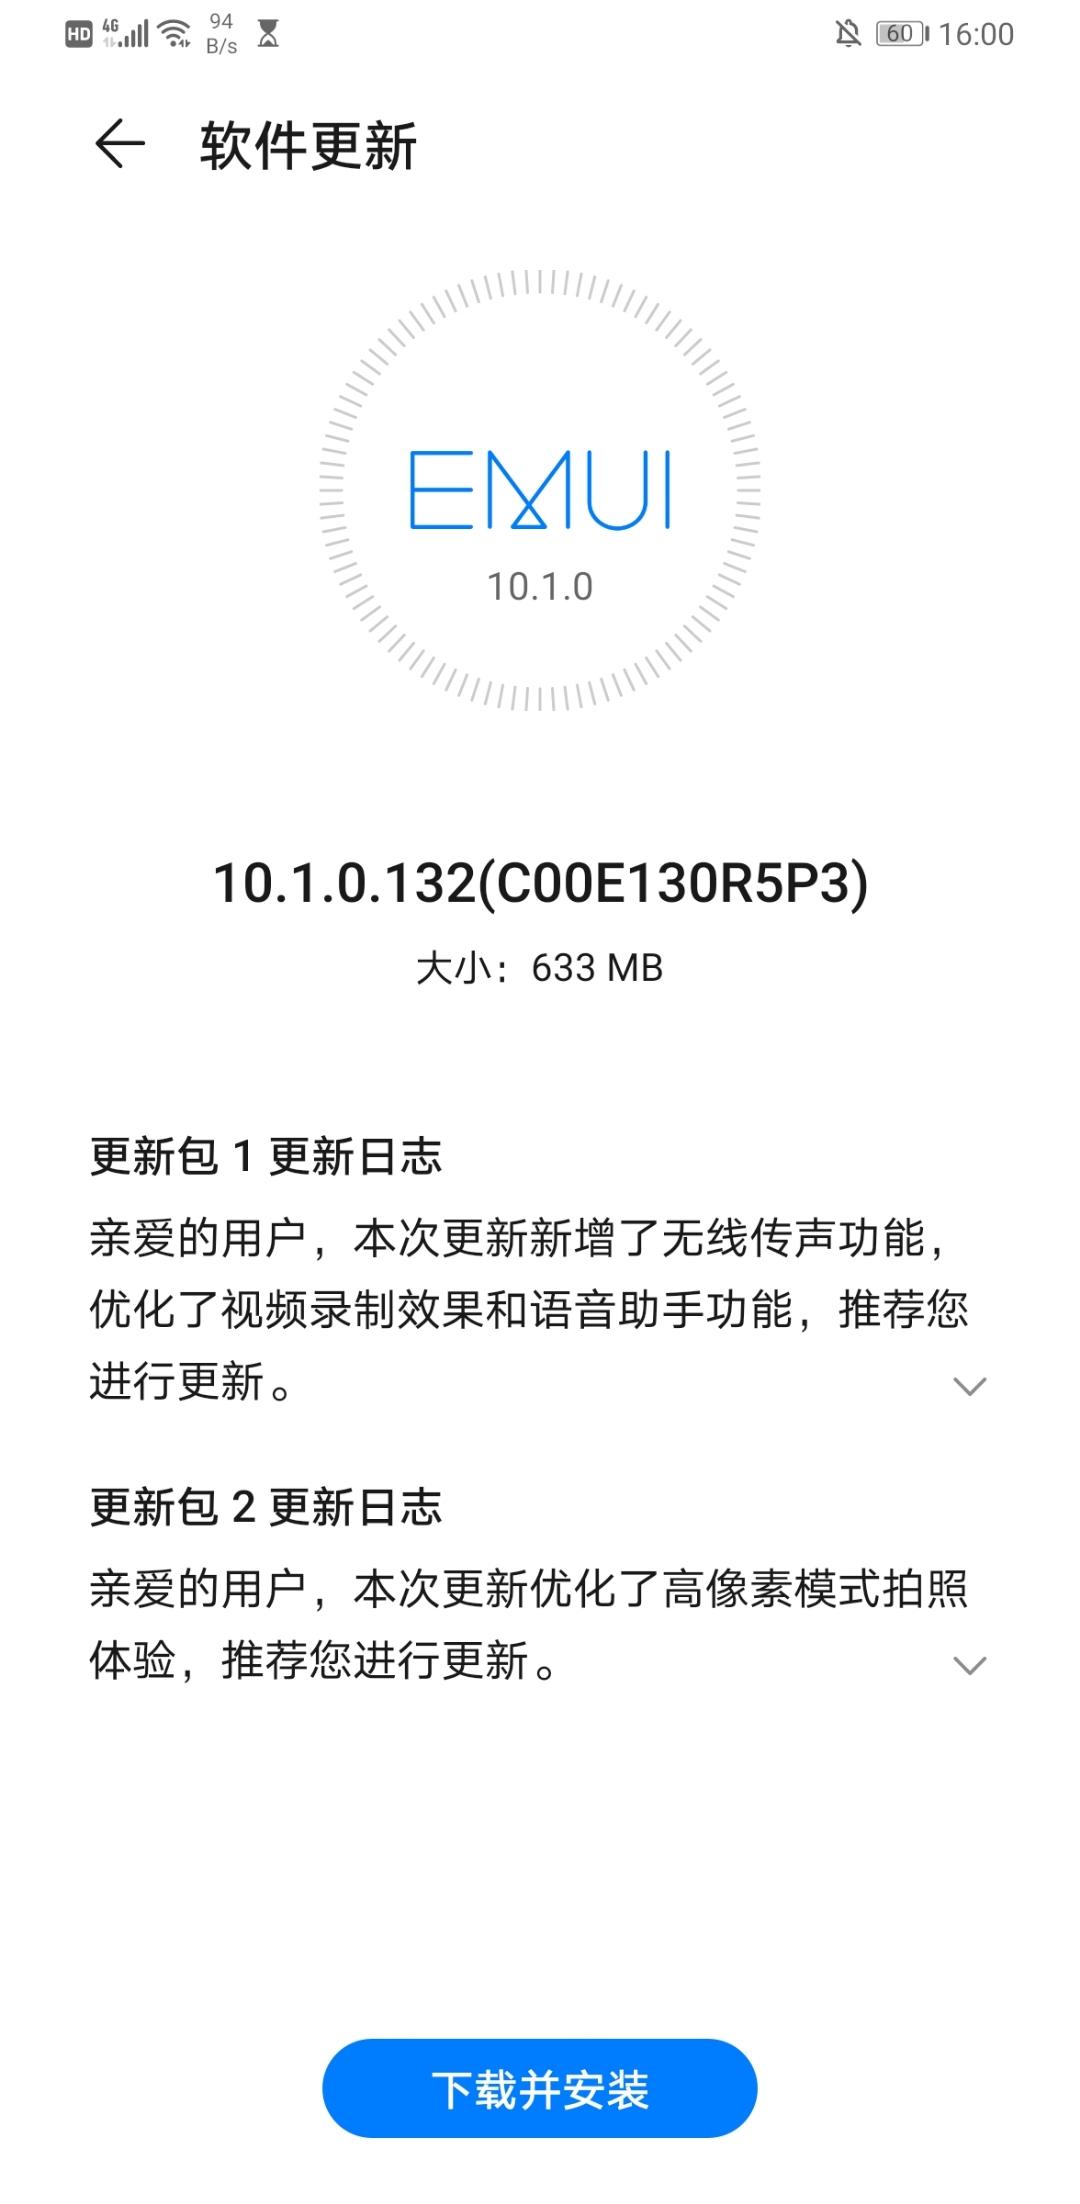 Screenshot_20200514_160004_com.huawei.android.hwouc.jpg